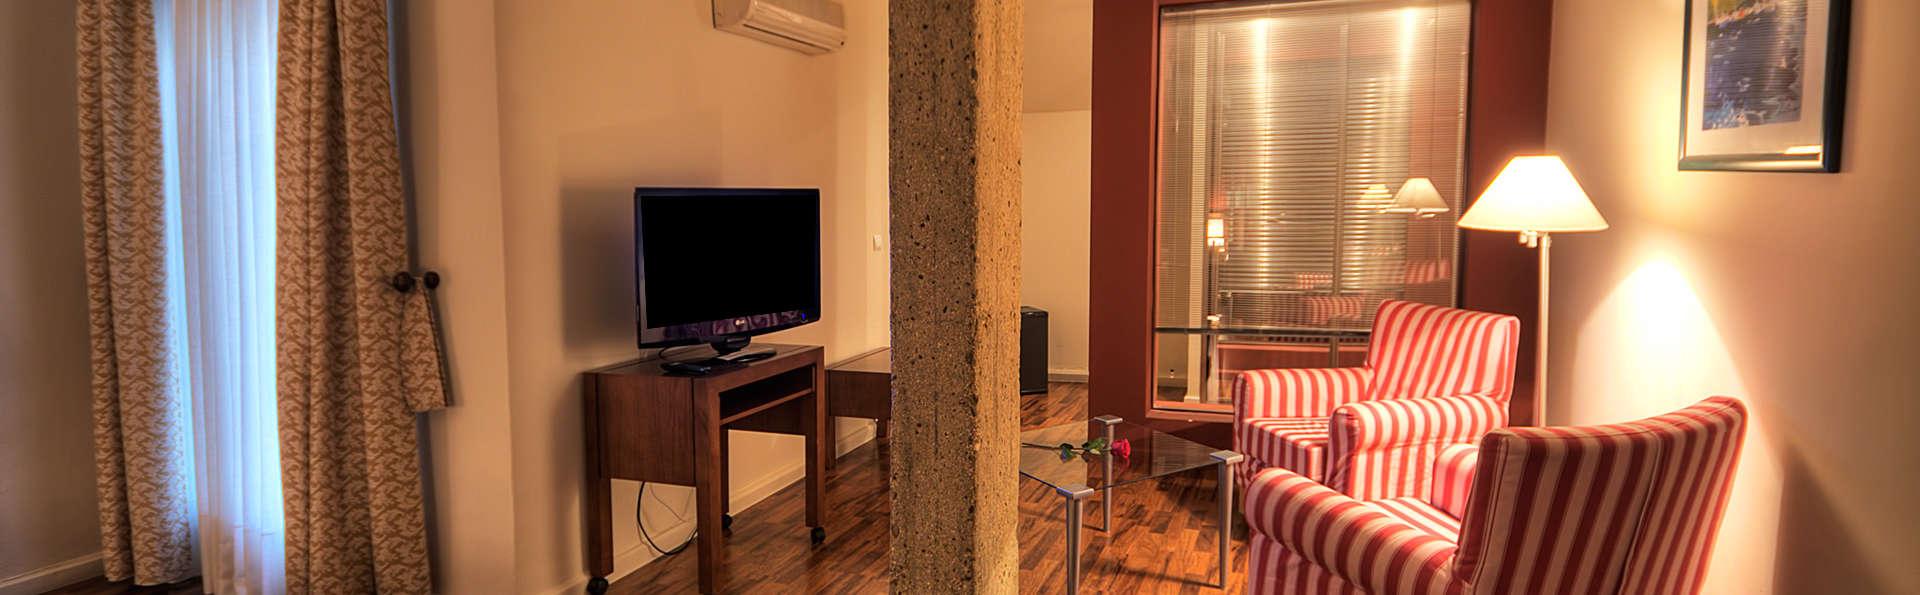 Hotel SPA Sinagoga - EDIT_room5.jpg